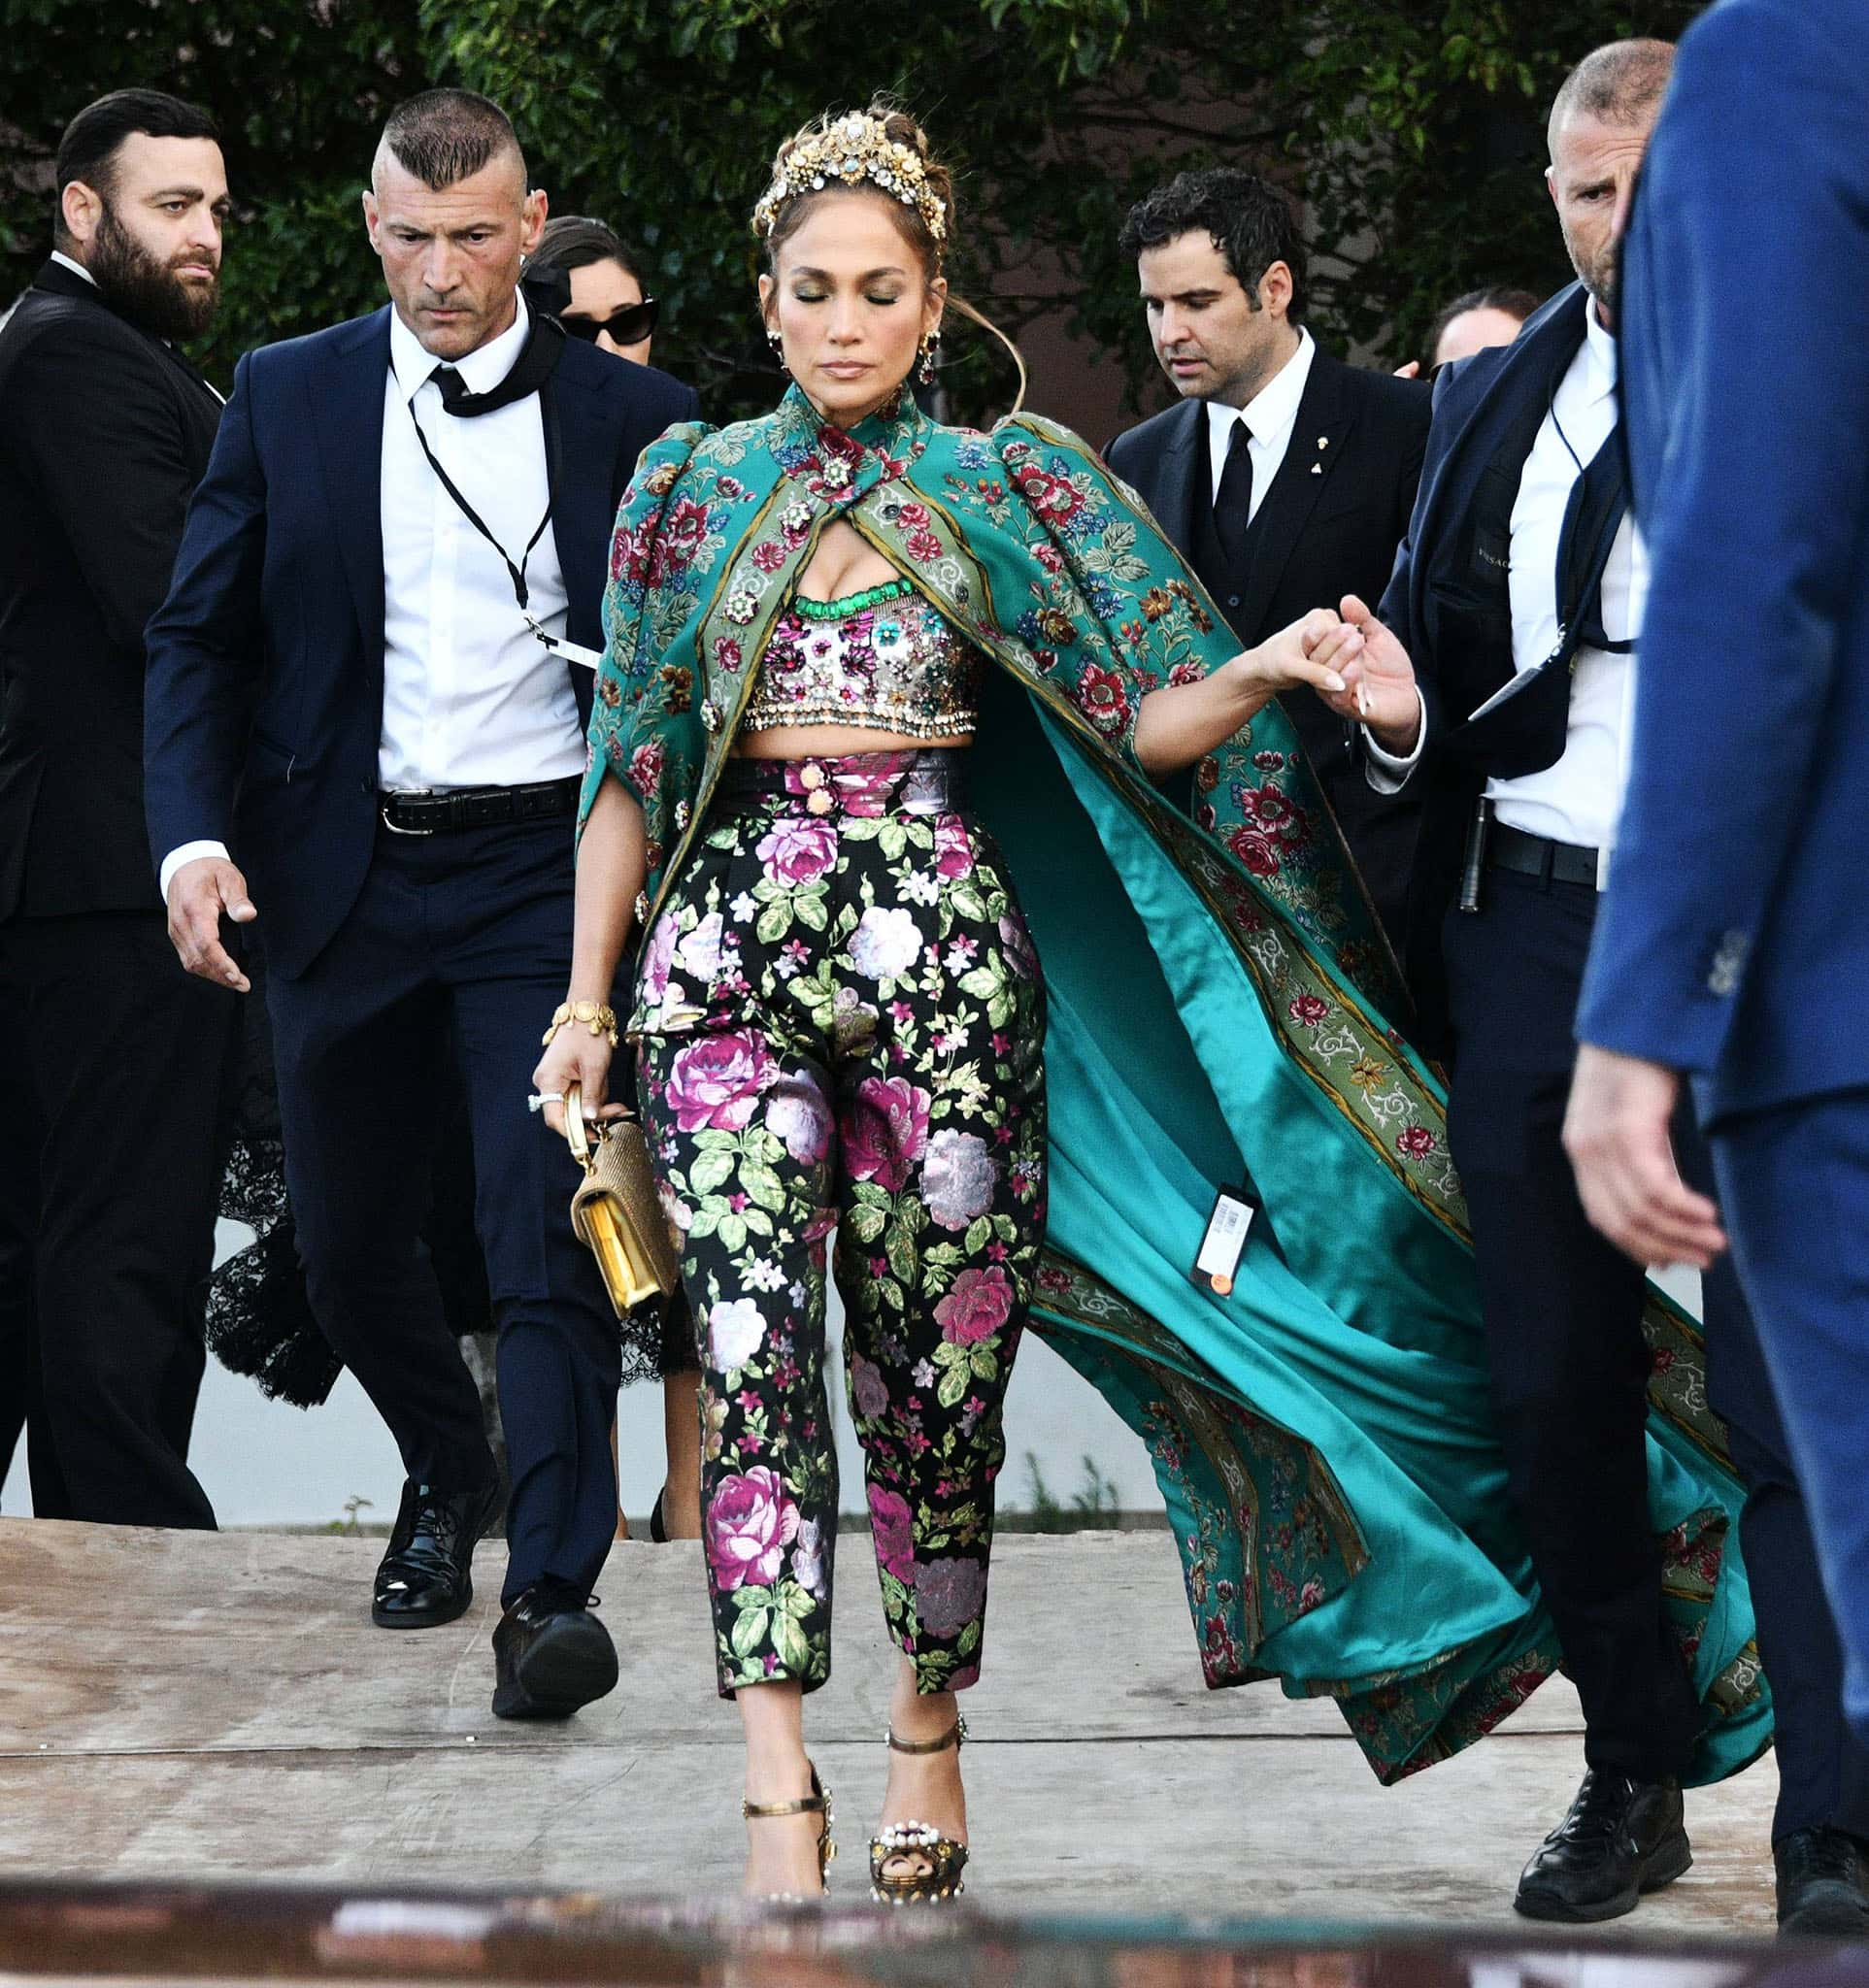 Jennifer Lopez looks regal in her Dolce & Gabbana embellished bralette and trousers